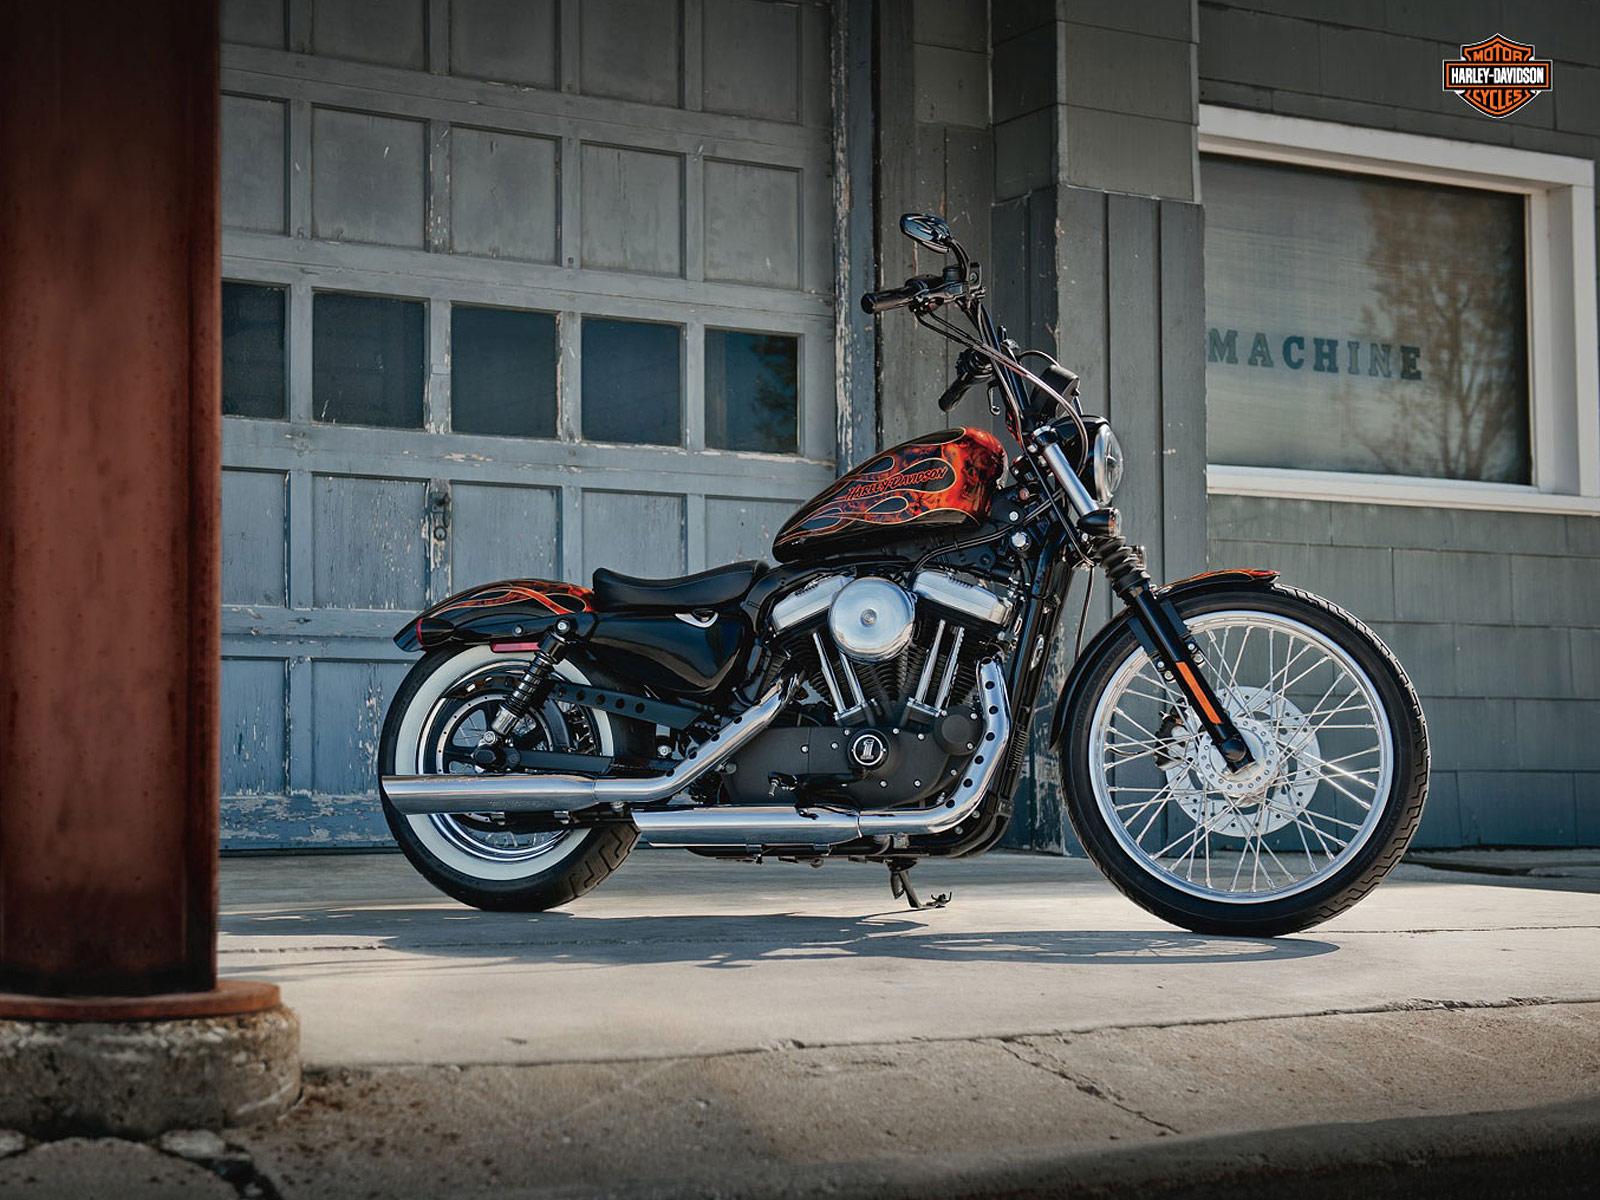 2012 Harley-Davidson Sportster Nightster